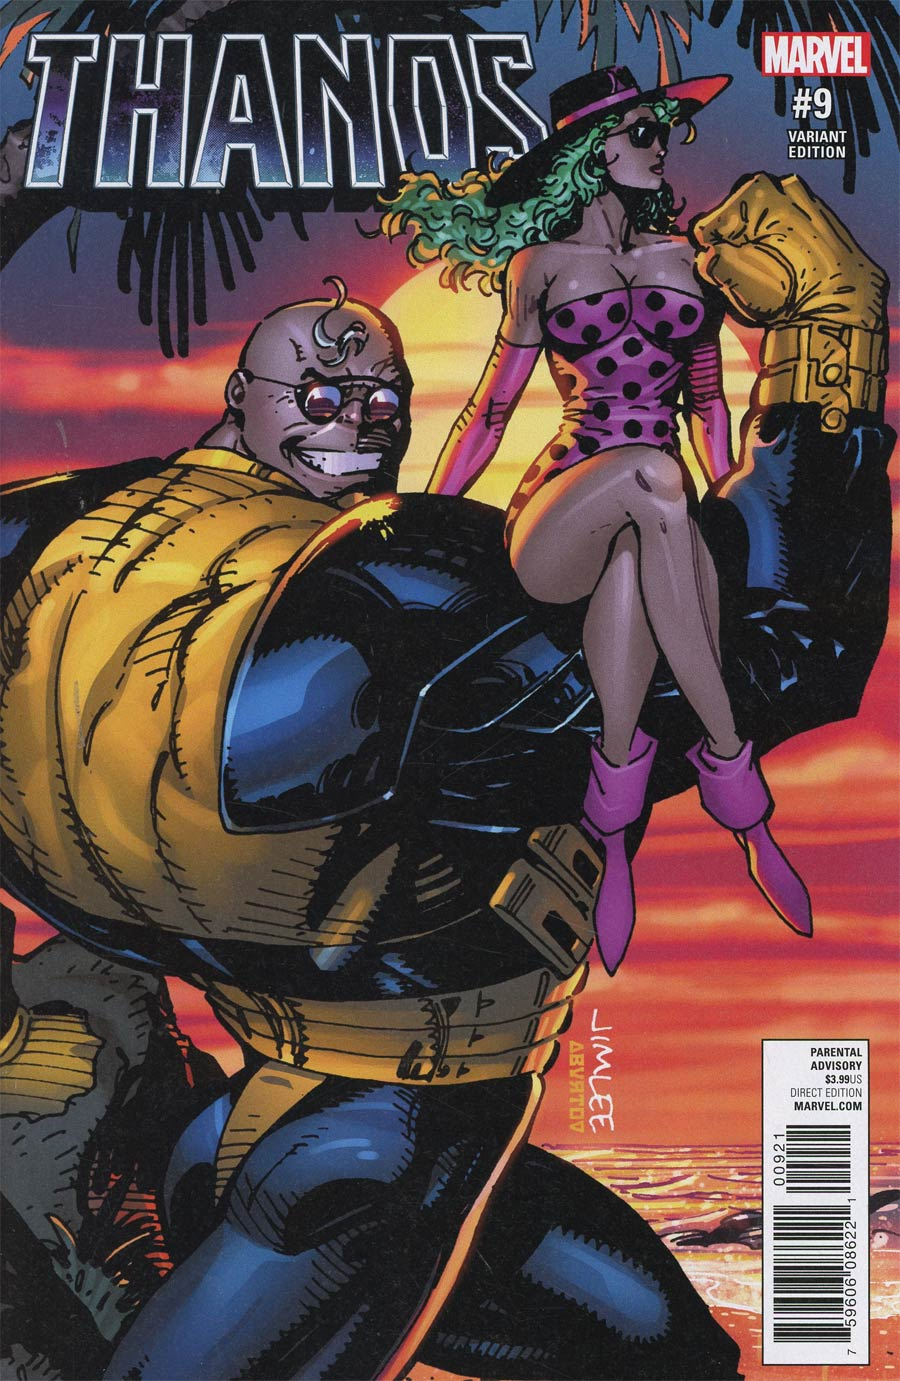 Thanos Vol 2 #9 Cover B Variant Jim Lee X-Men Trading Card Cover